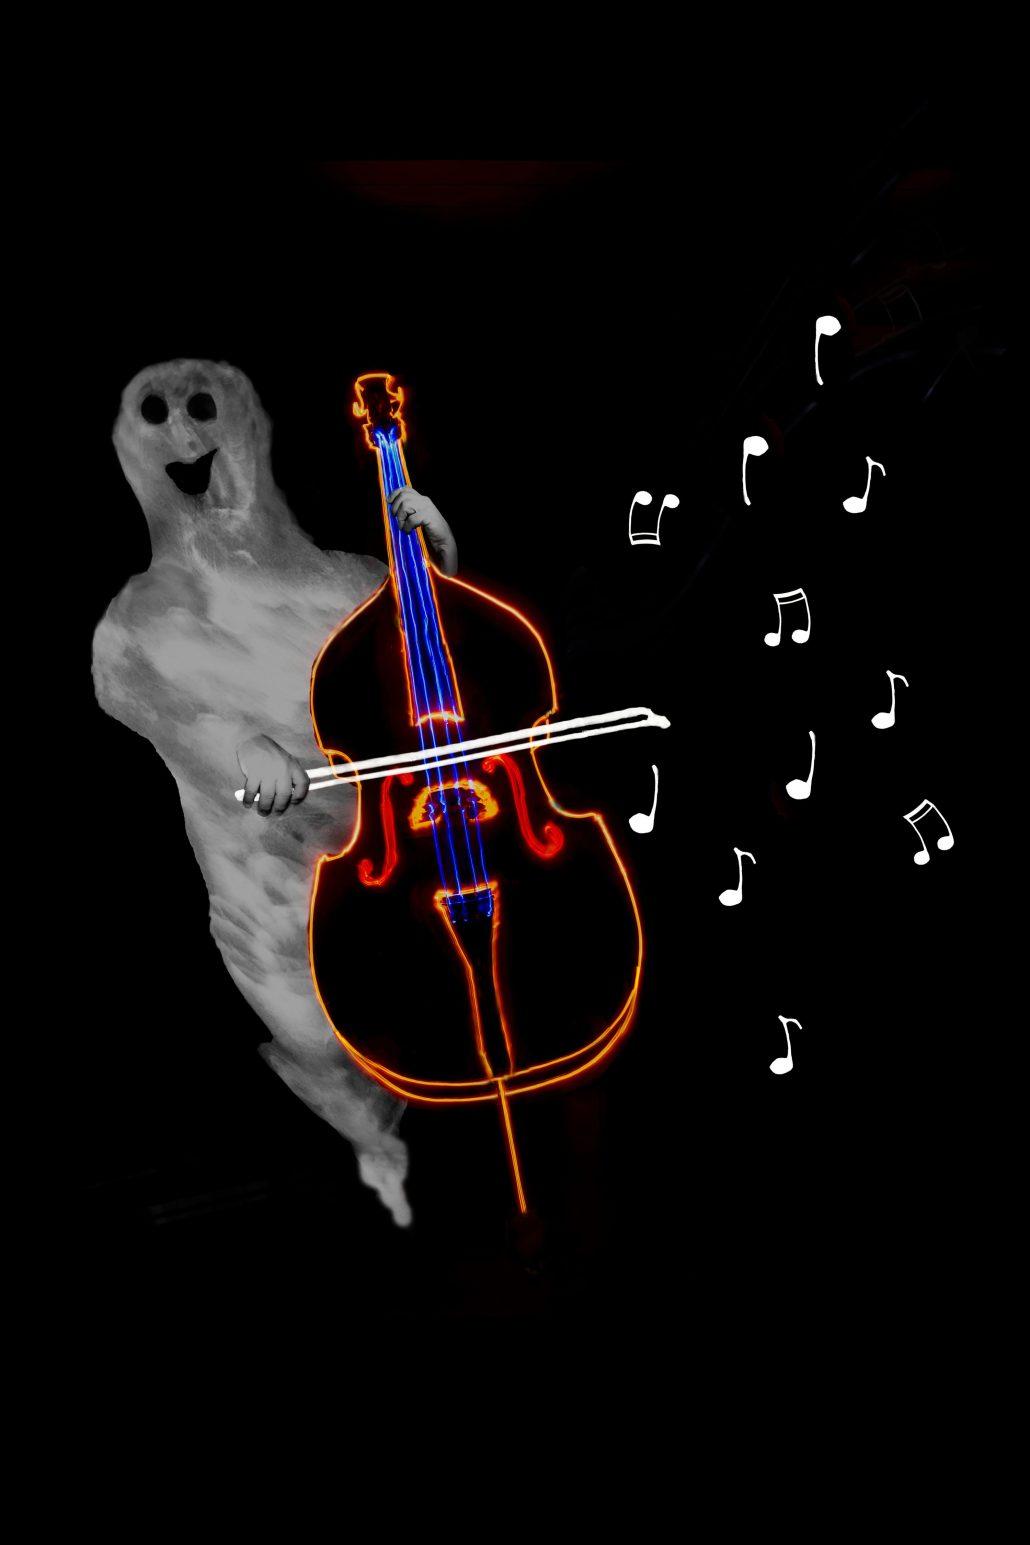 fantôme musicien